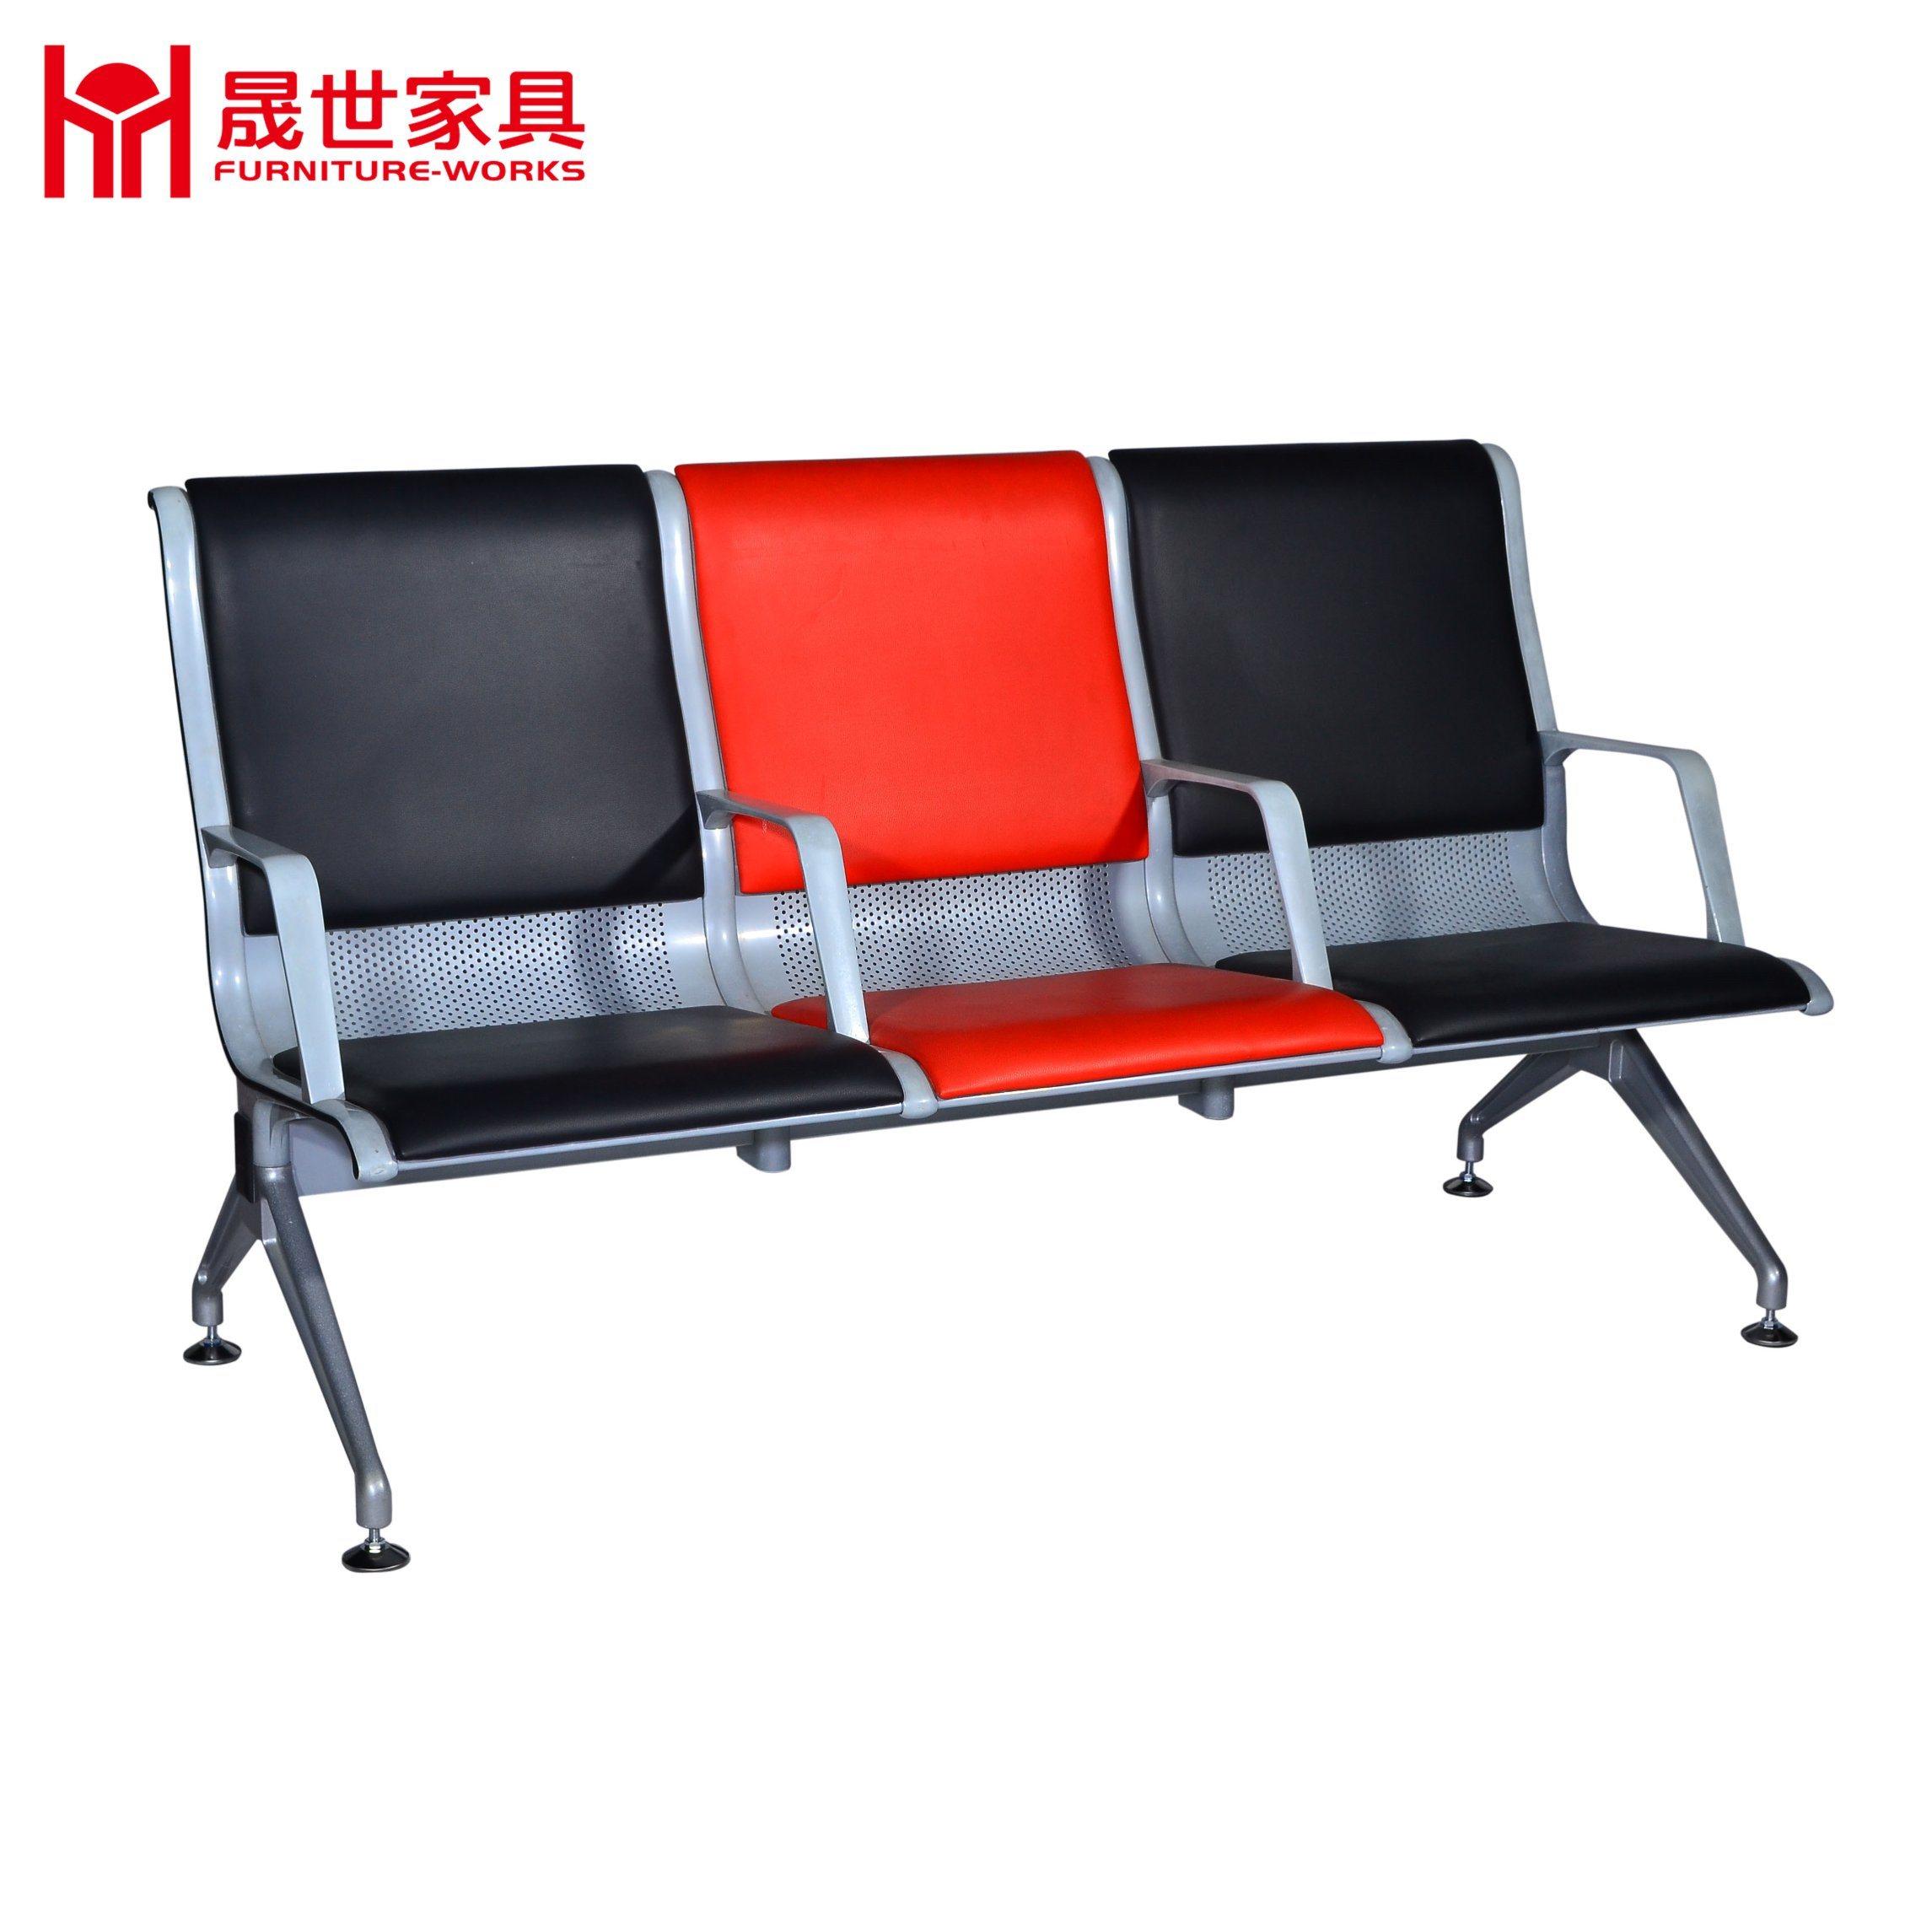 Modern Design Aluminum Alloy Public Waiting Chair / Airport Waiting Chairs / Waiting Room Chairs